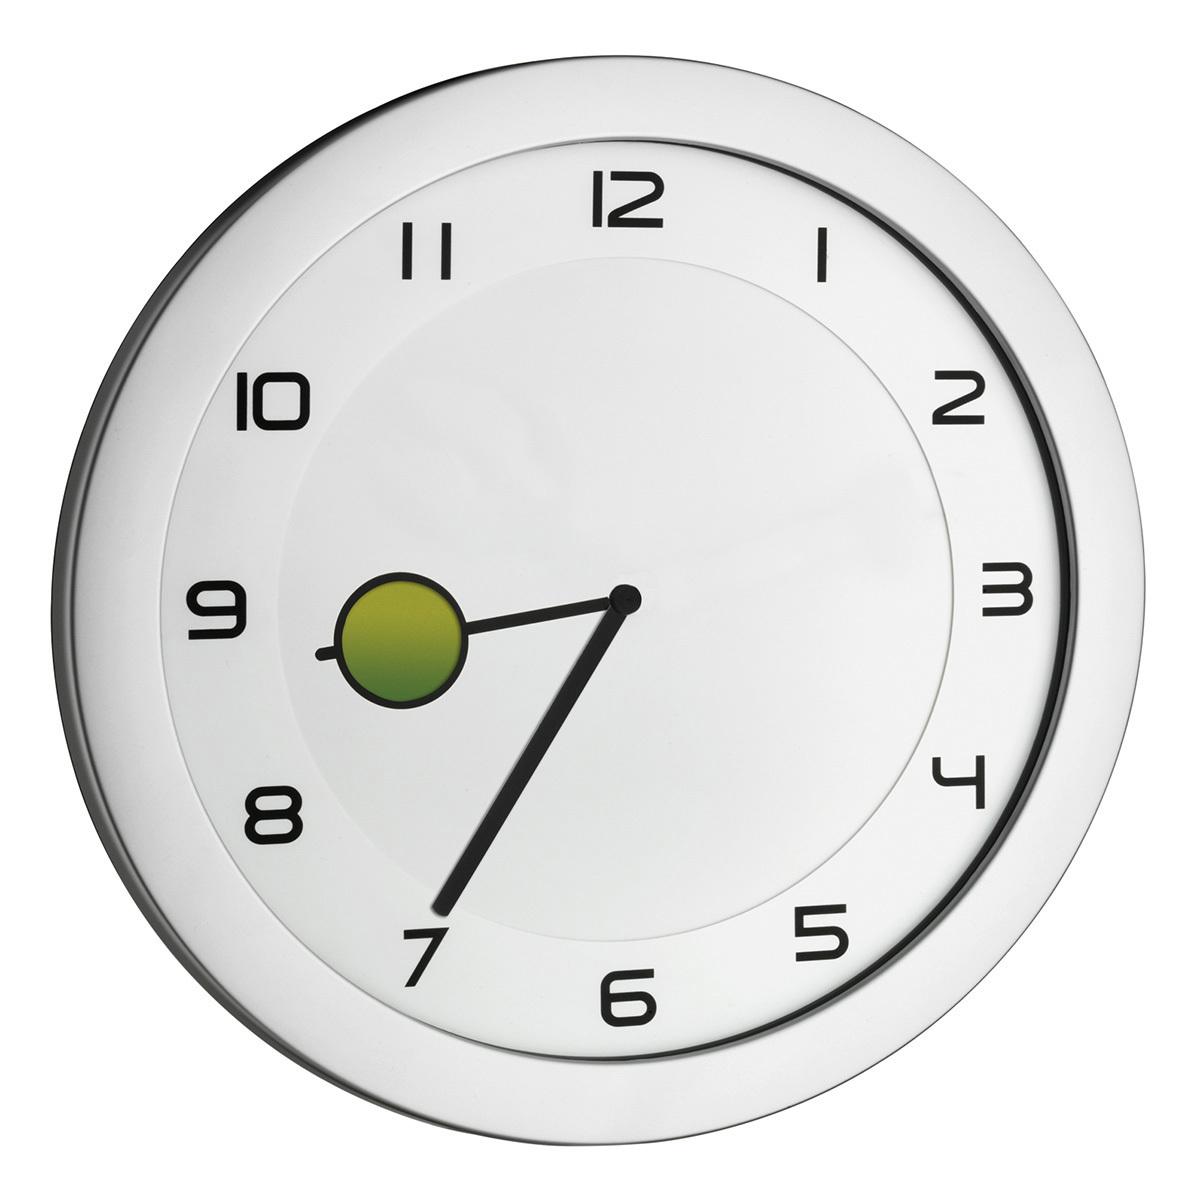 60-3028-54-analoge-wanduhr-happy-hour-hellgrün-1200x1200px.jpg